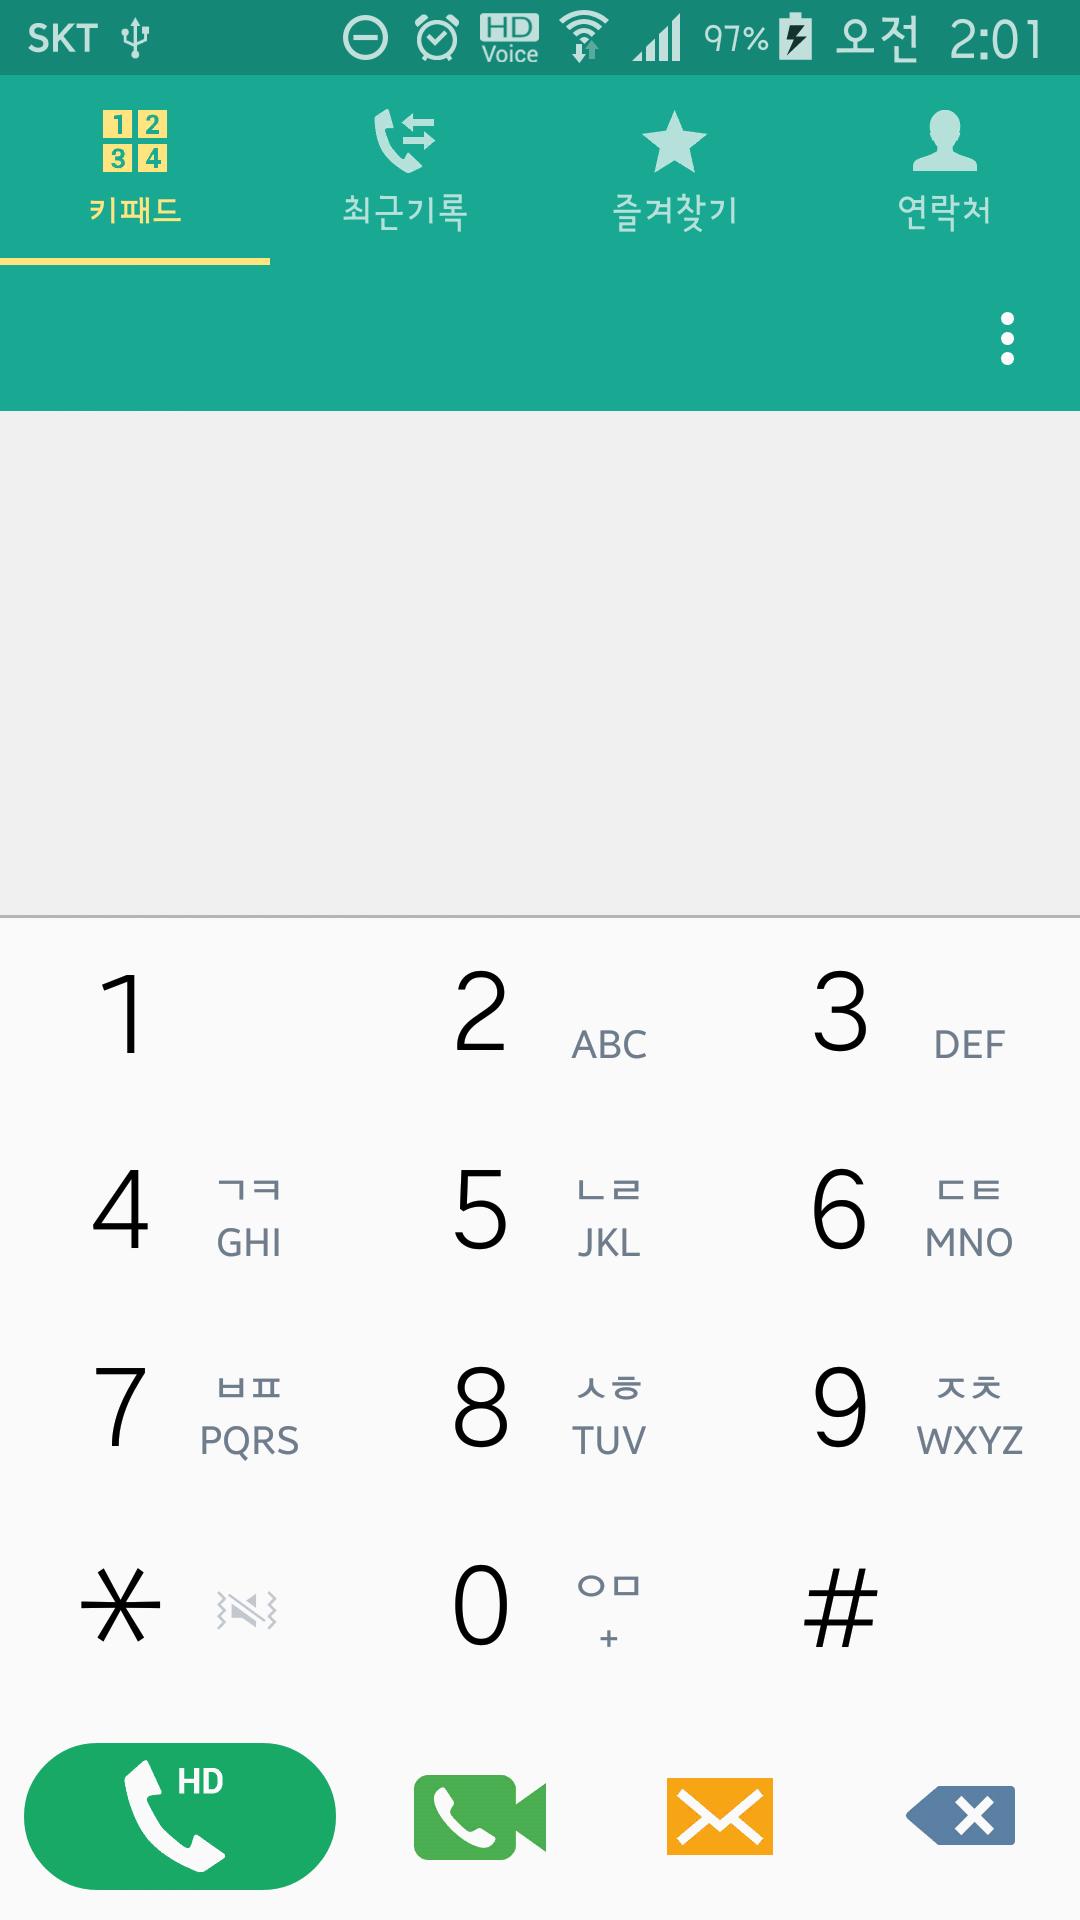 Screenshot_2014-12-06-02-01-03[1].png